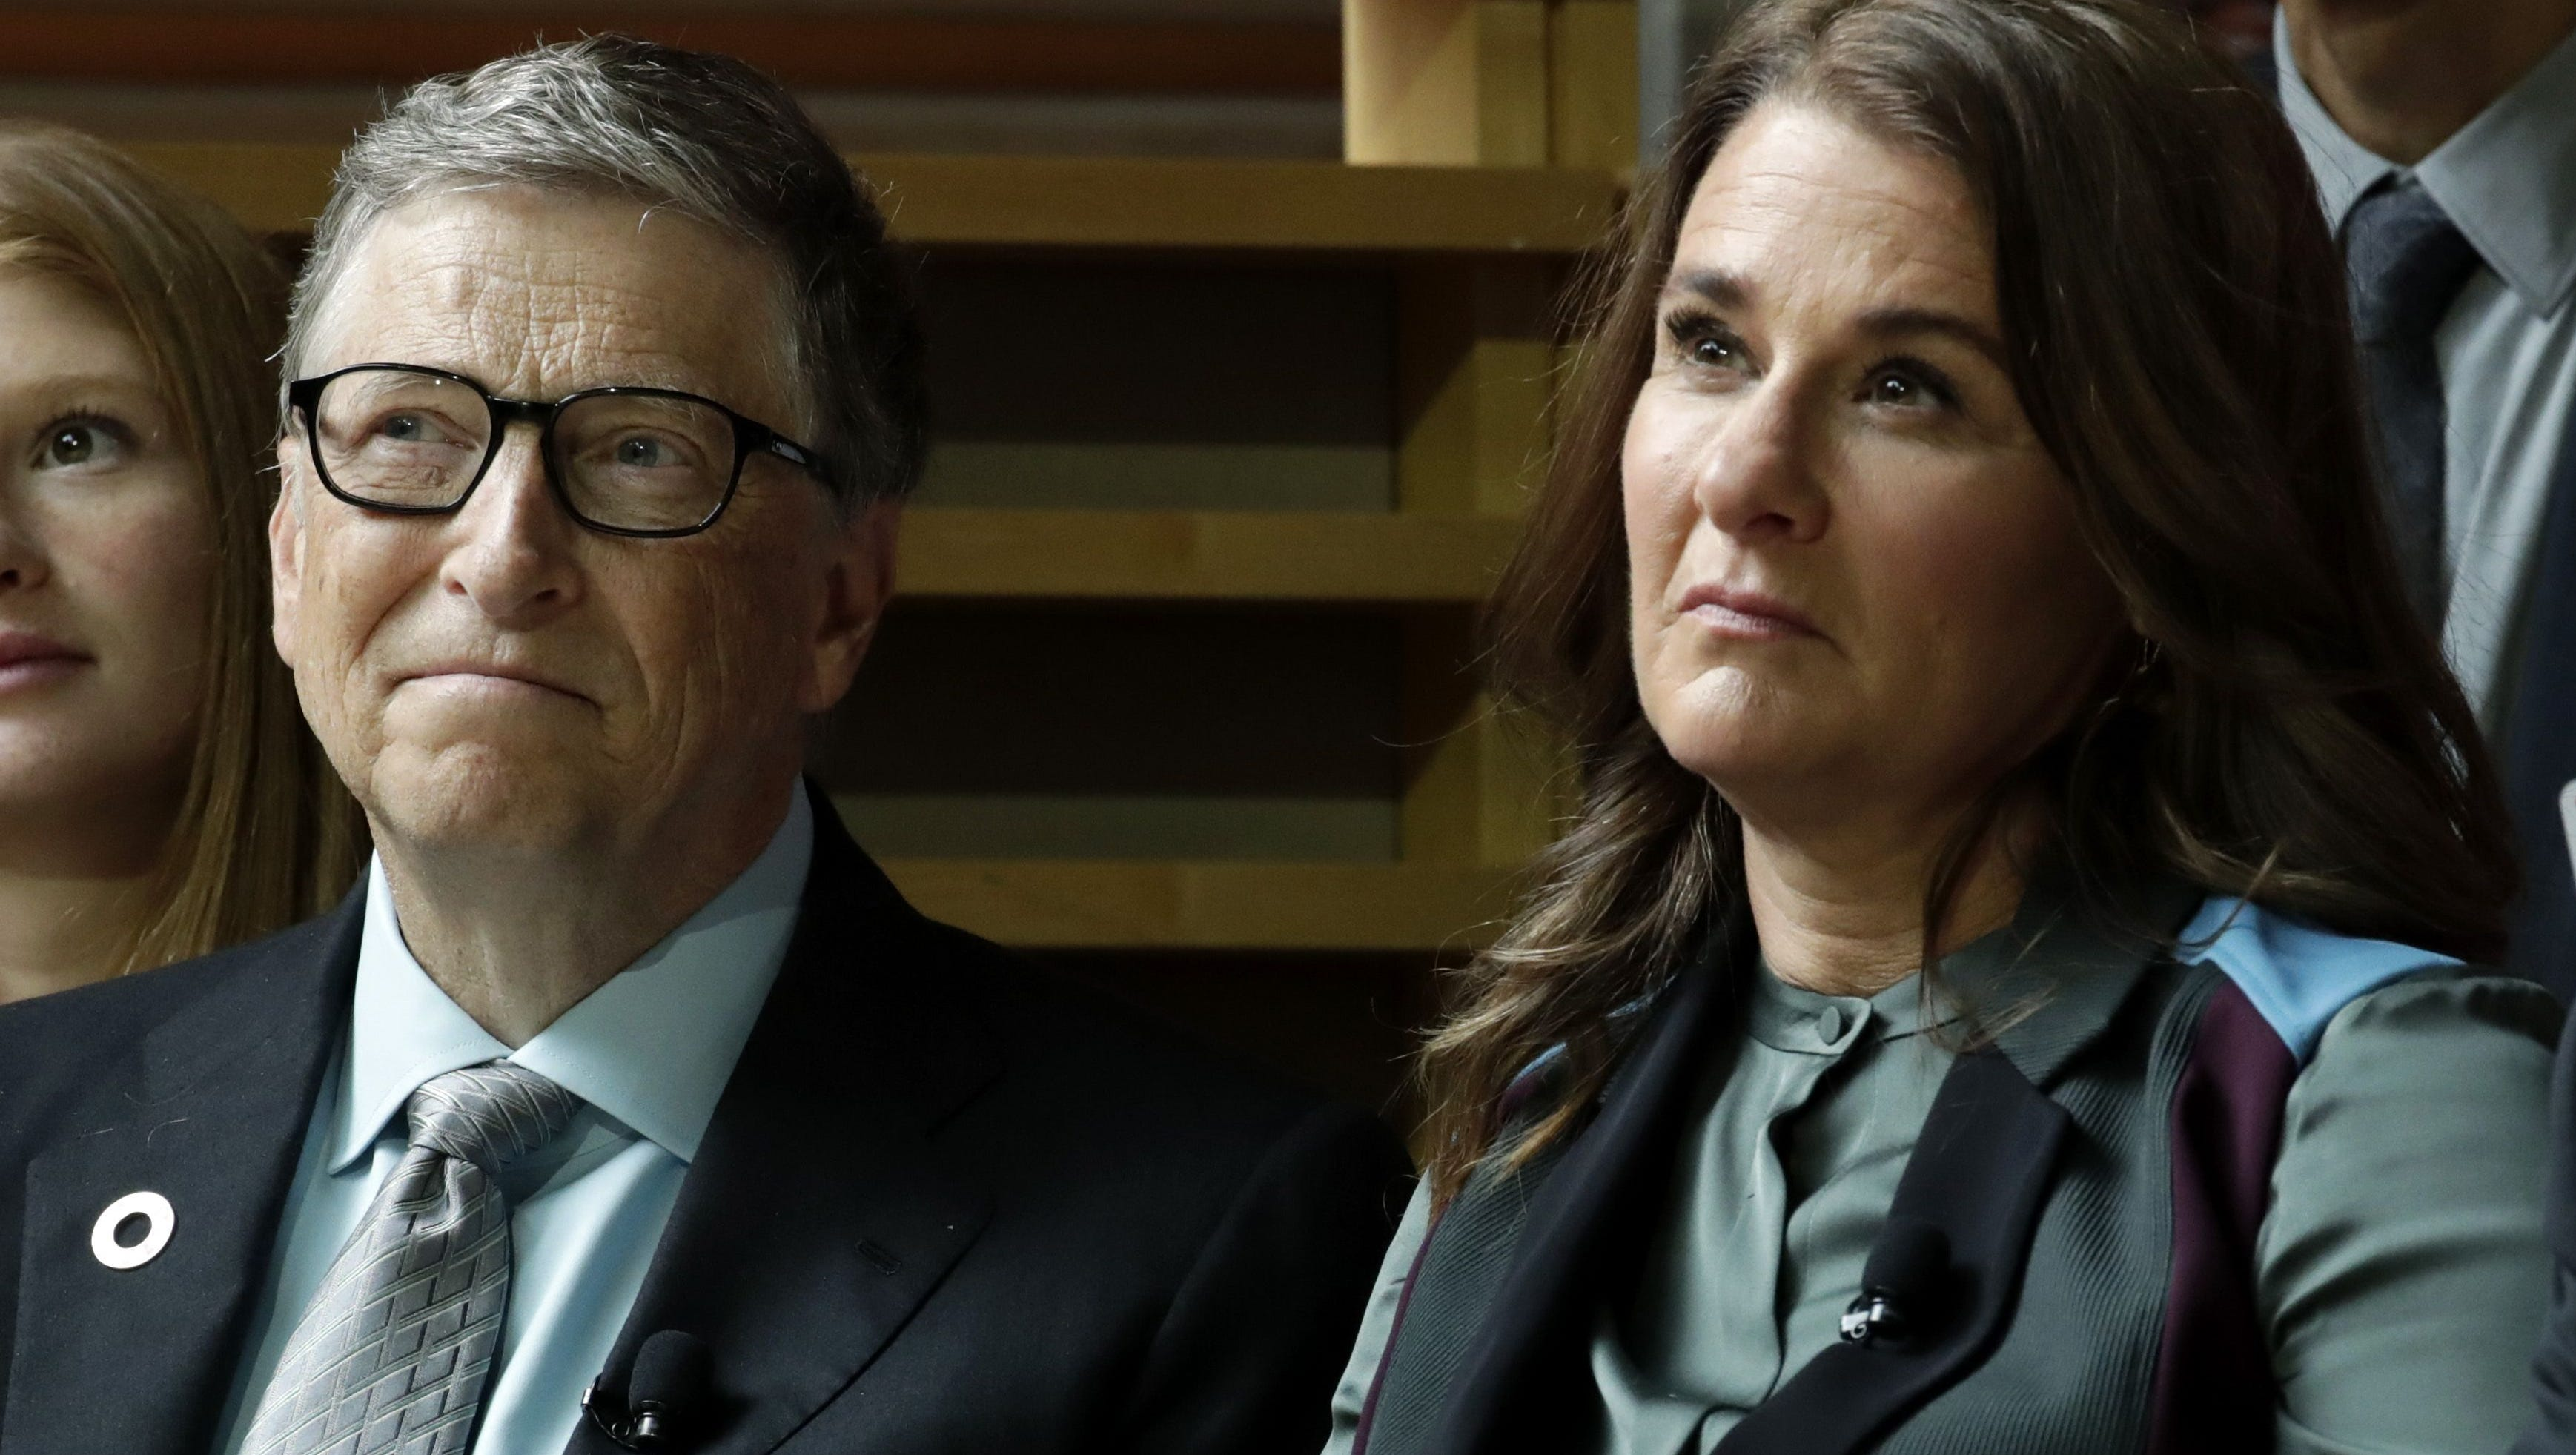 Top 3 Charitable Donations Bill Gates Mark Zuckerberg Michael Dell